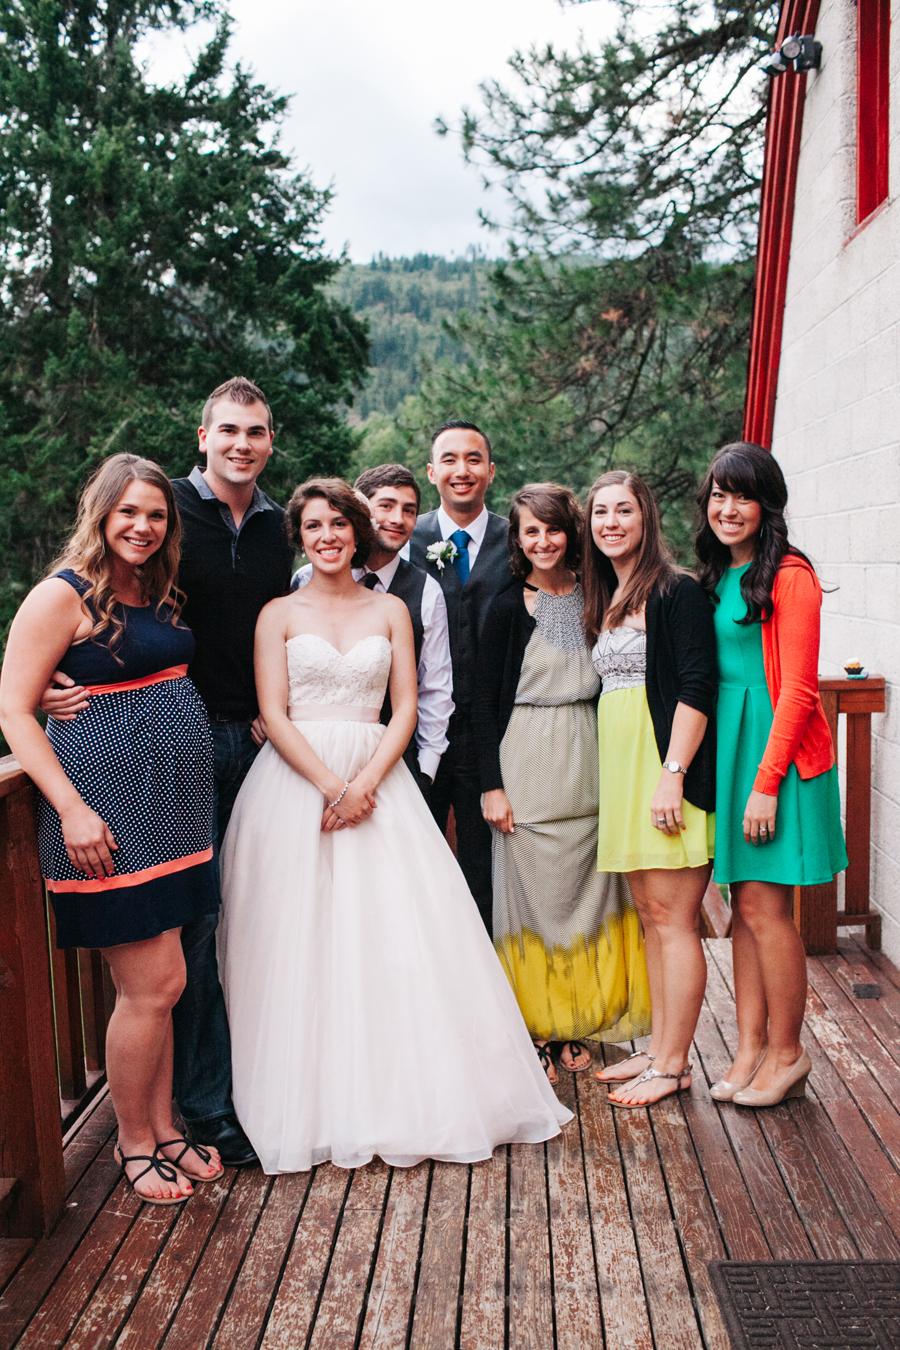 098-pine-river-ranch-leavenworth-washington-destination-wedding-katheryn-moran-photography.jpg